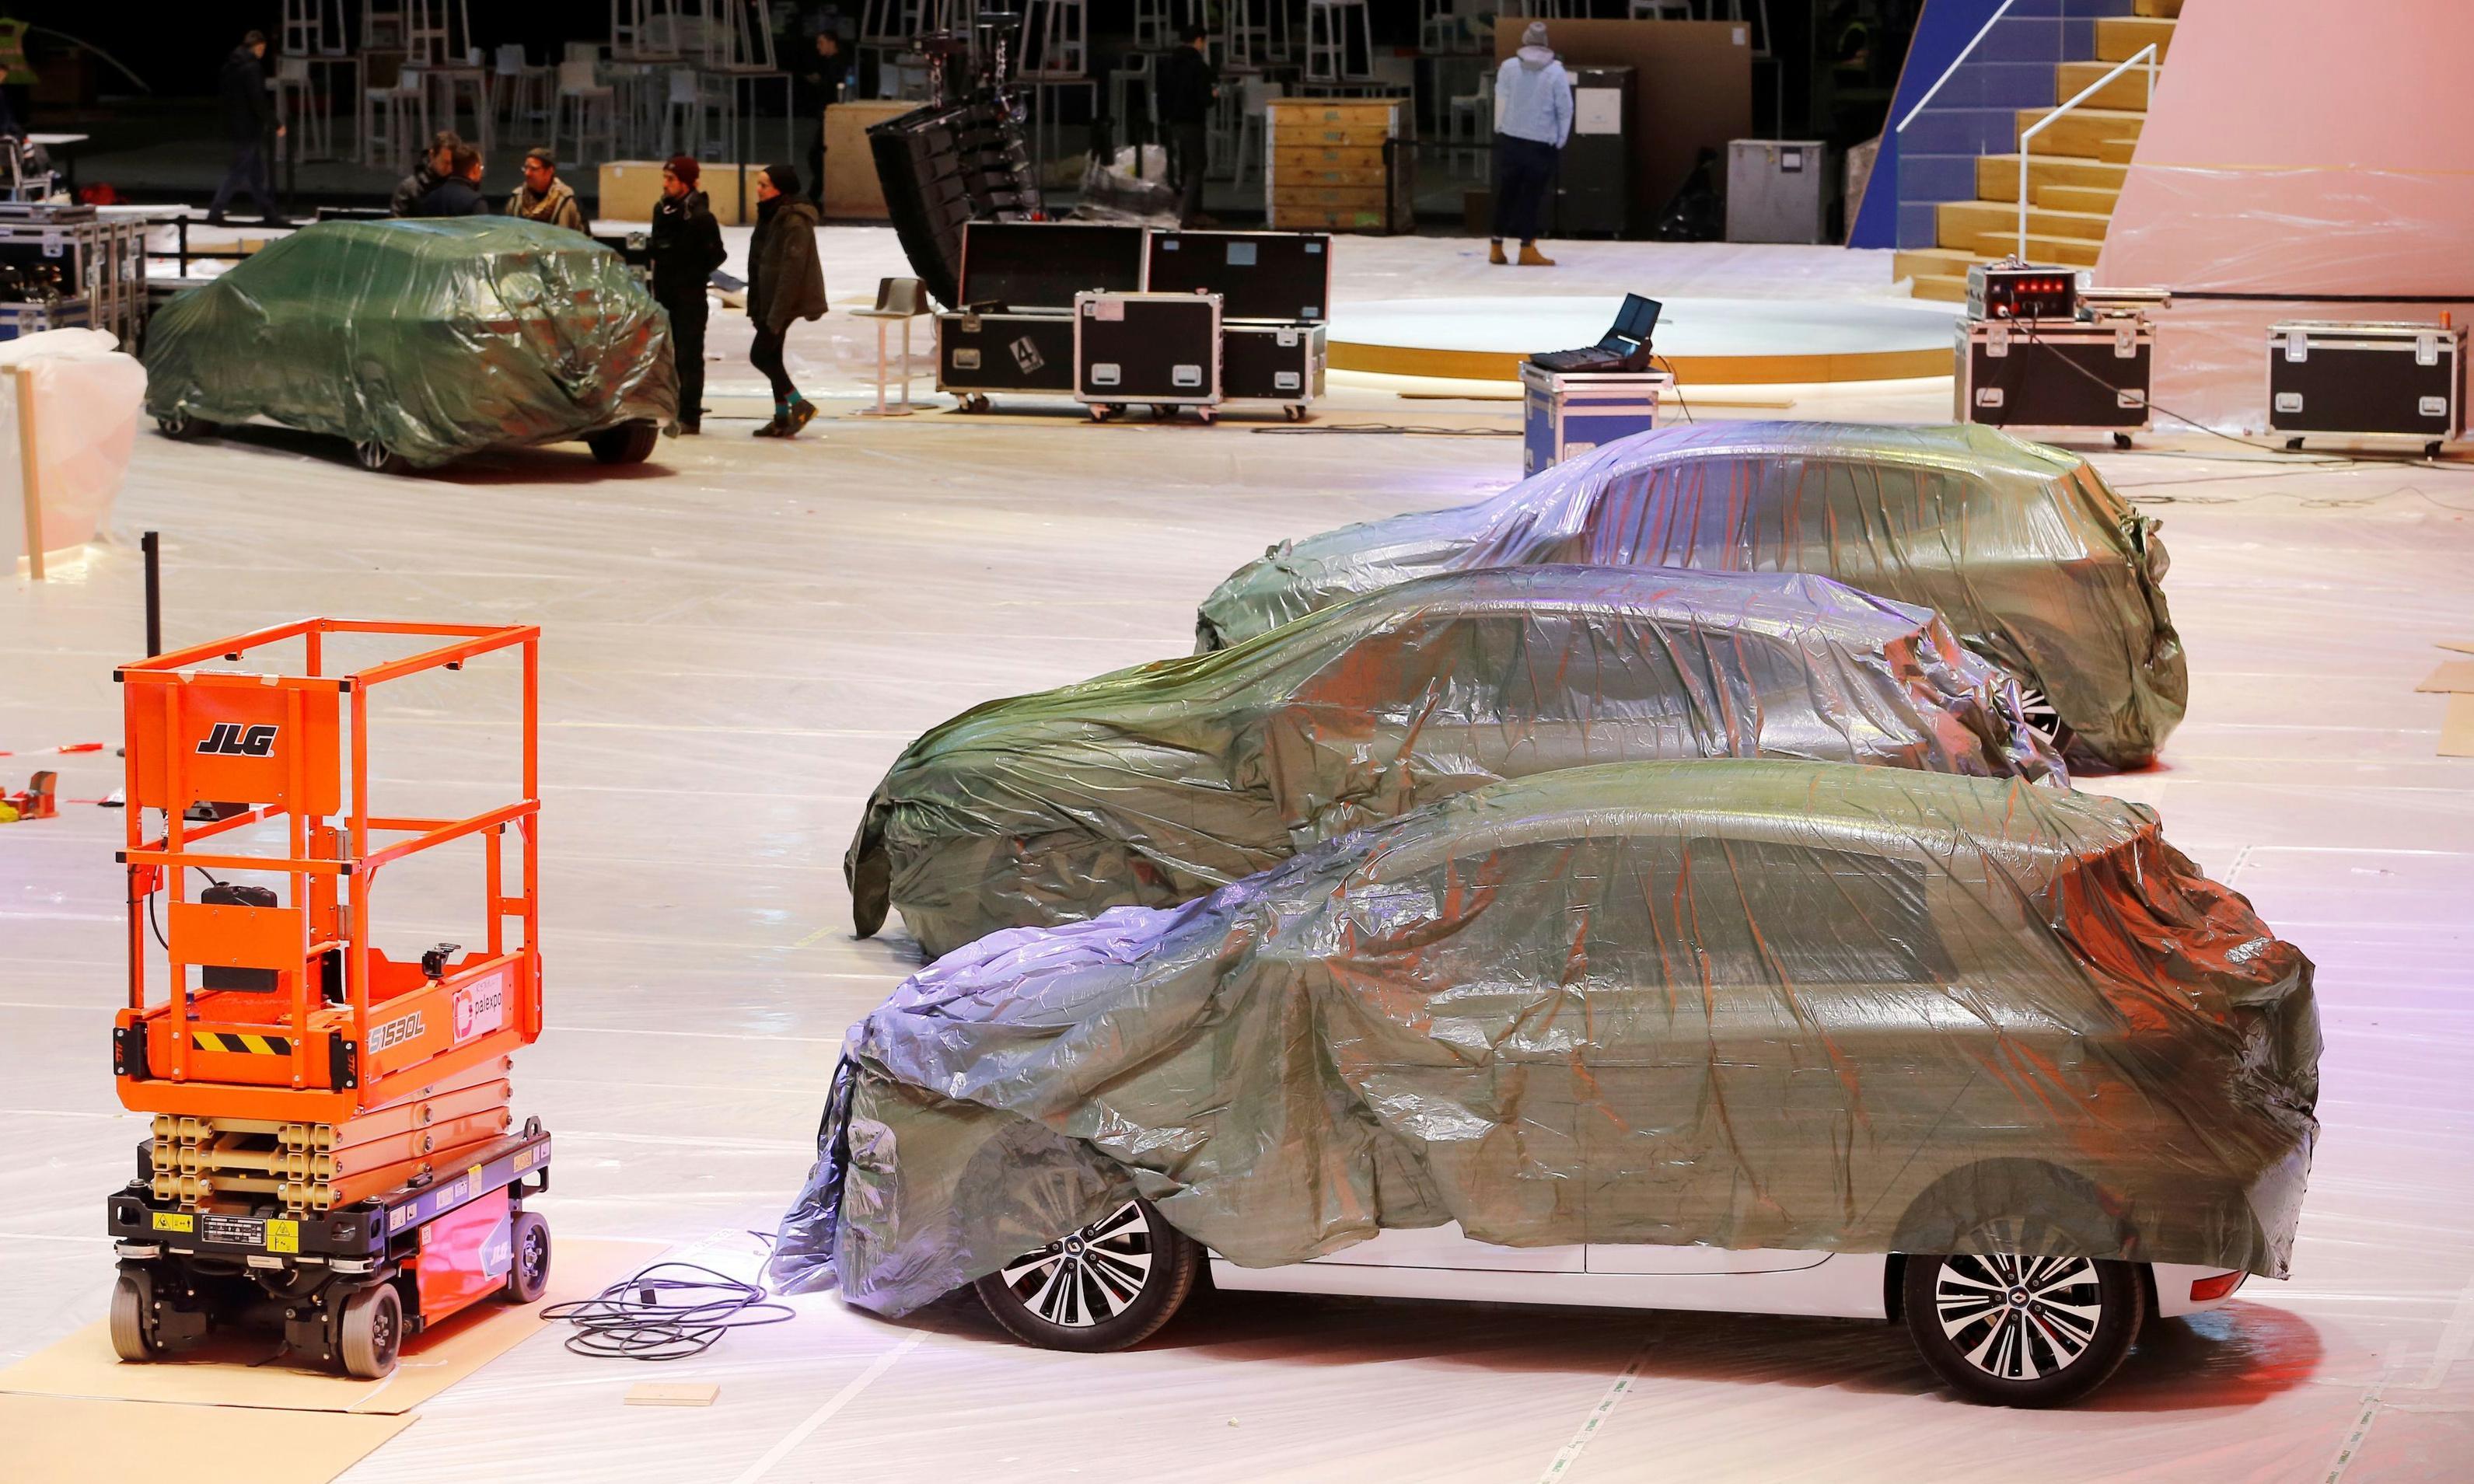 Geneva motor show cancelled as Switzerland bans large events